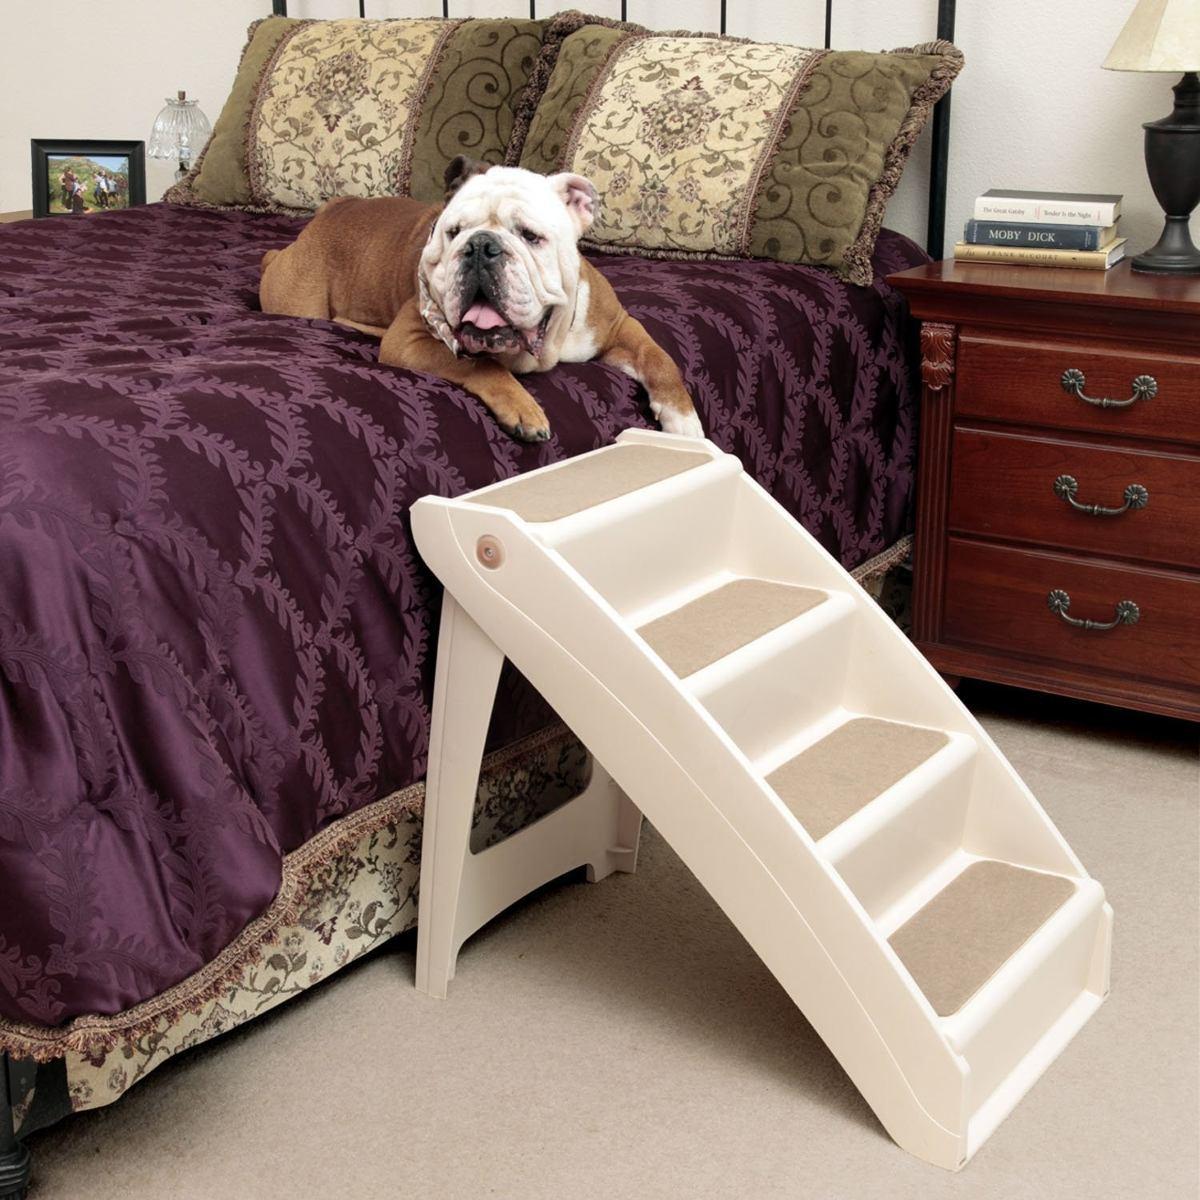 Escalera pupstep solvit para mascotas perro gato xl - Escaleras para perros ...